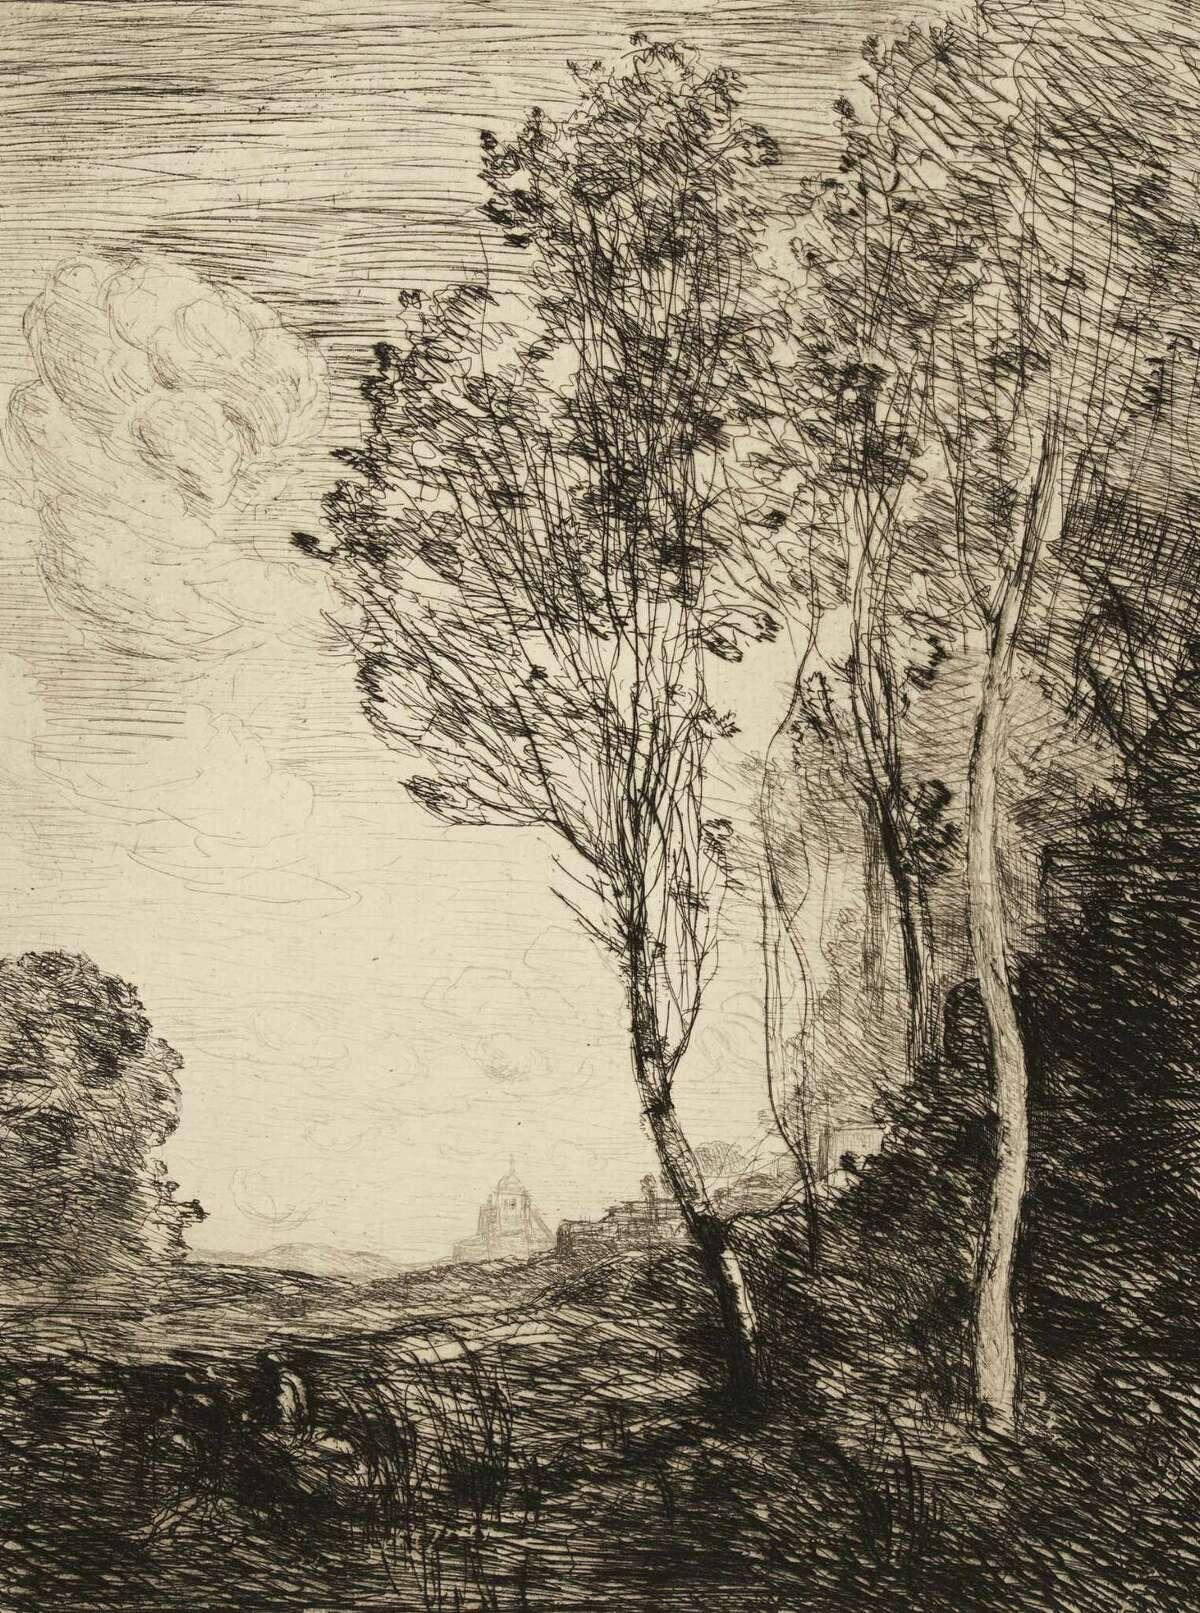 Jean-Baptiste-Camille Corot, Souvenir d'Italie, 1863. Etching. Photo courtesy the Clark